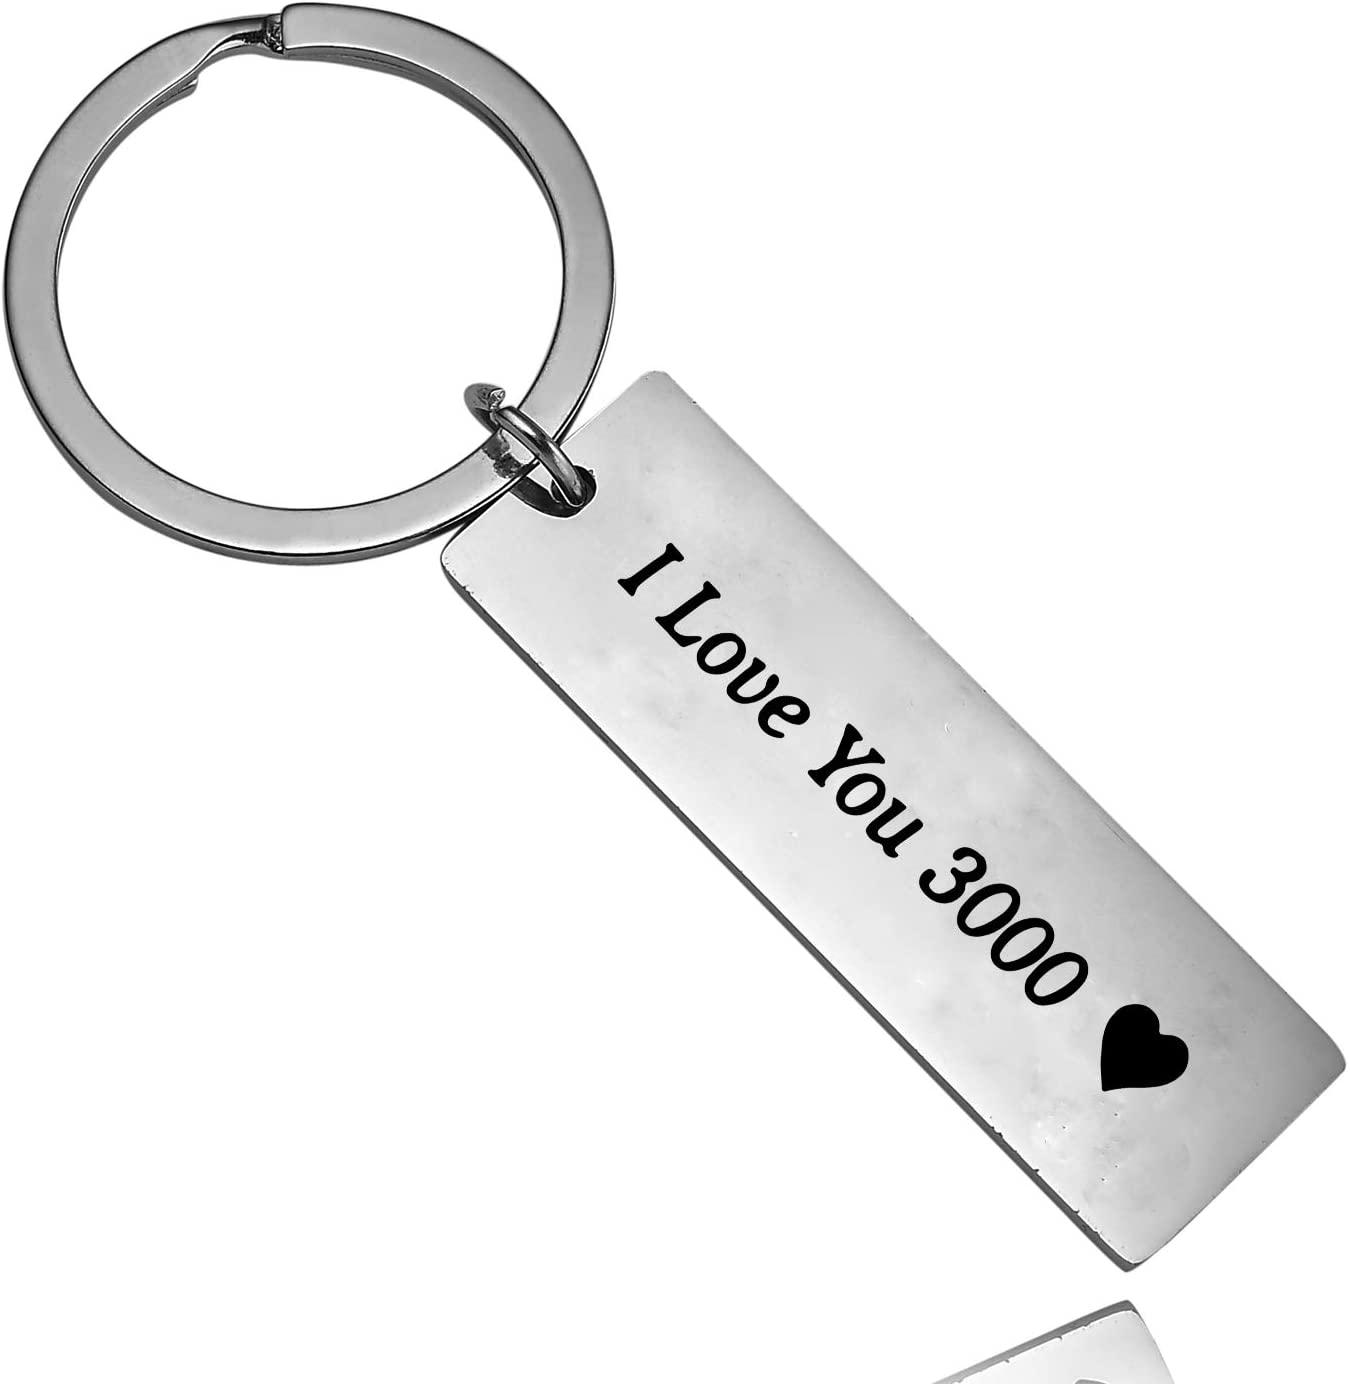 BESPMOSP I Love You 3000 Keychain Inspired Keychain Gift for Fans, Mom, Dad, Husband, Boyfriend Best Friend Gift (I Love You 3000)